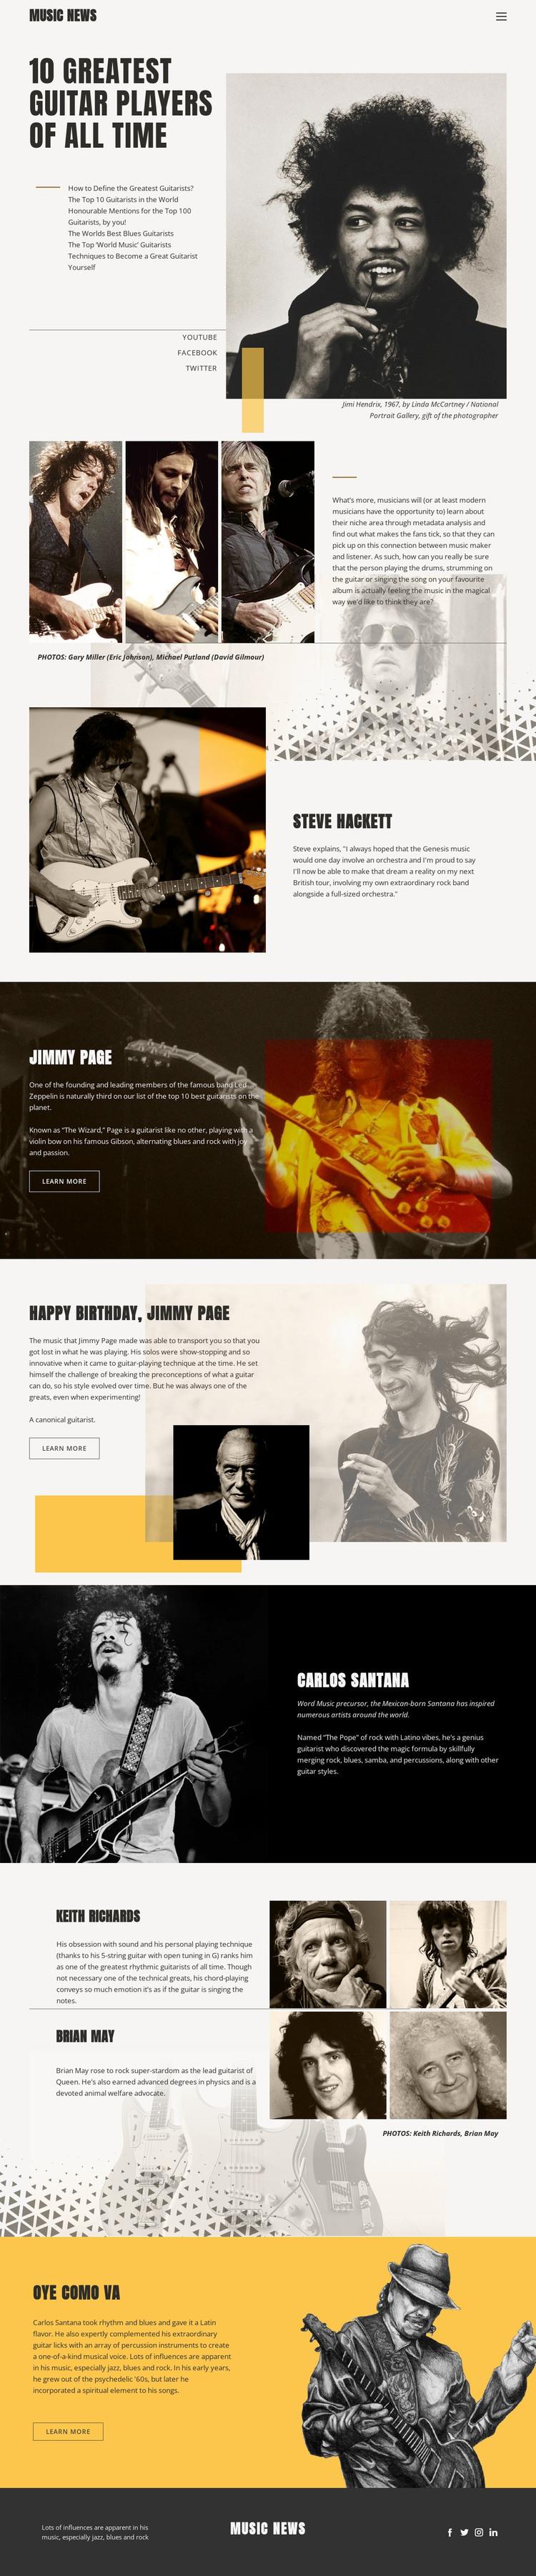 The Top Guitar Players Web Design